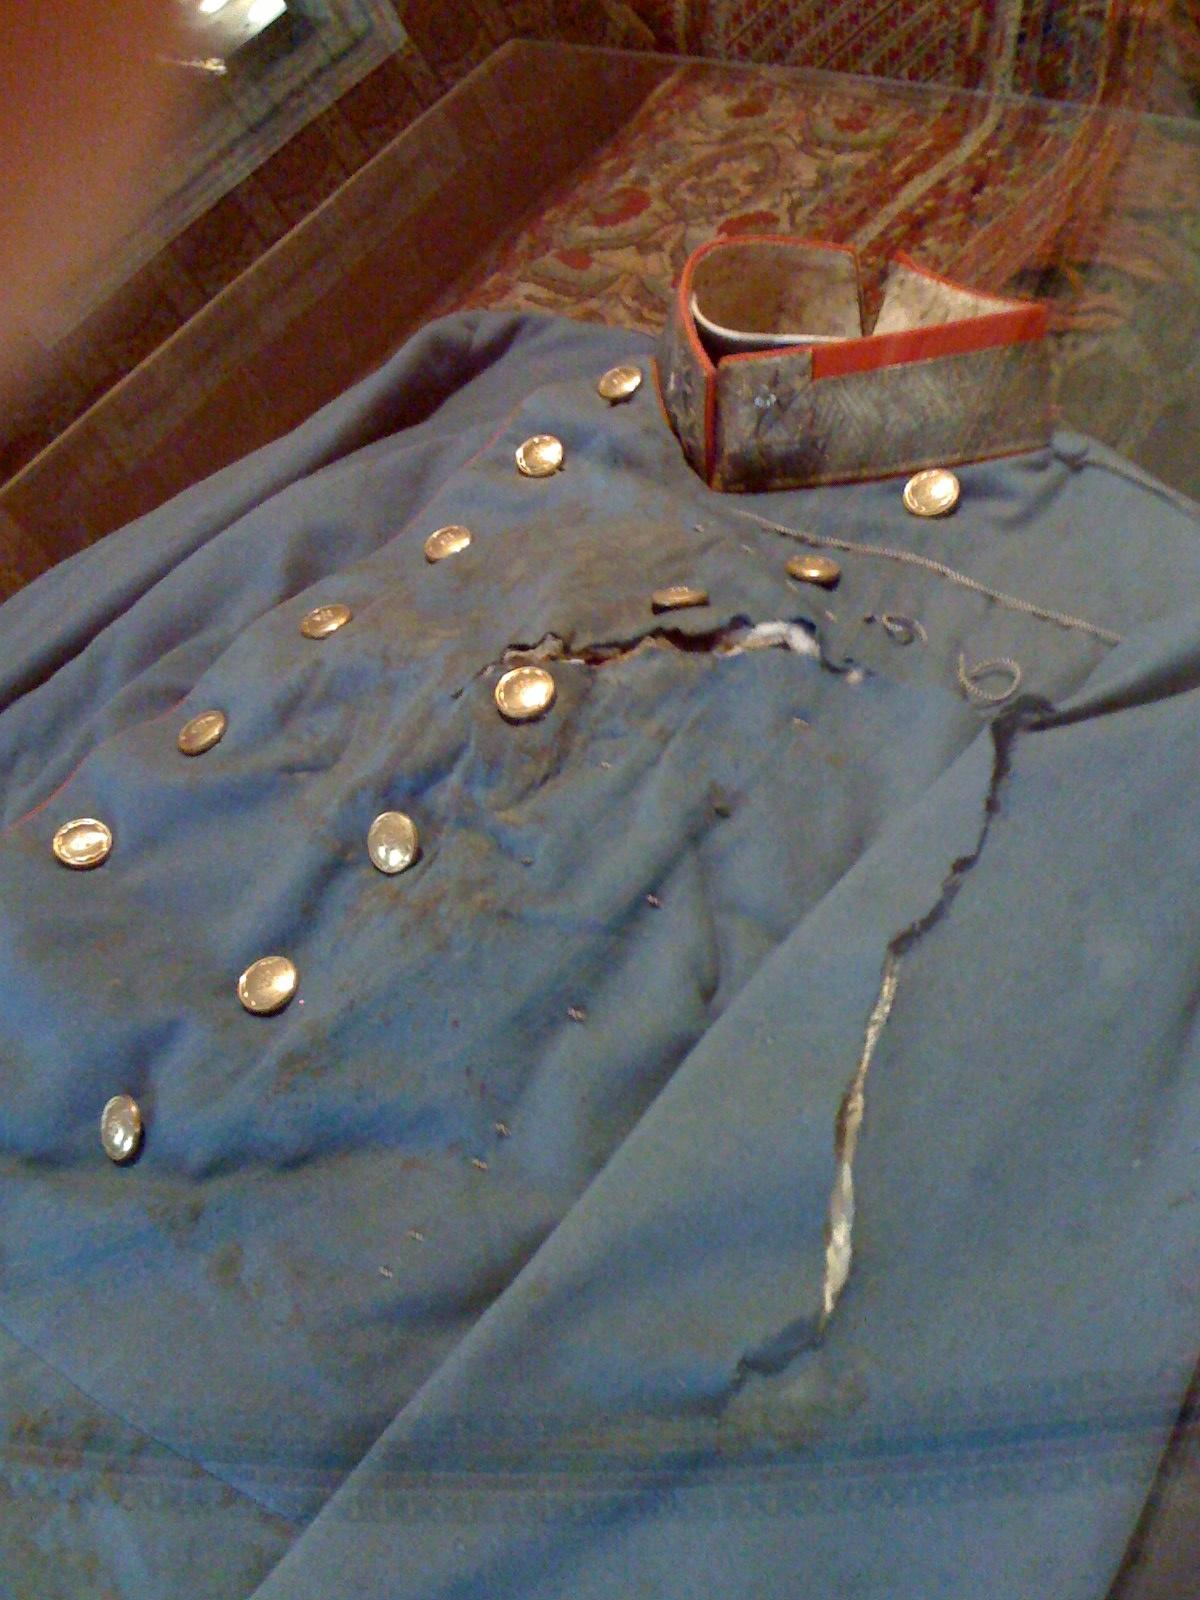 File:Uniform worn by Ferdinand when he was assassinated in Sarajevo.jpg -  Wikimedia Commons